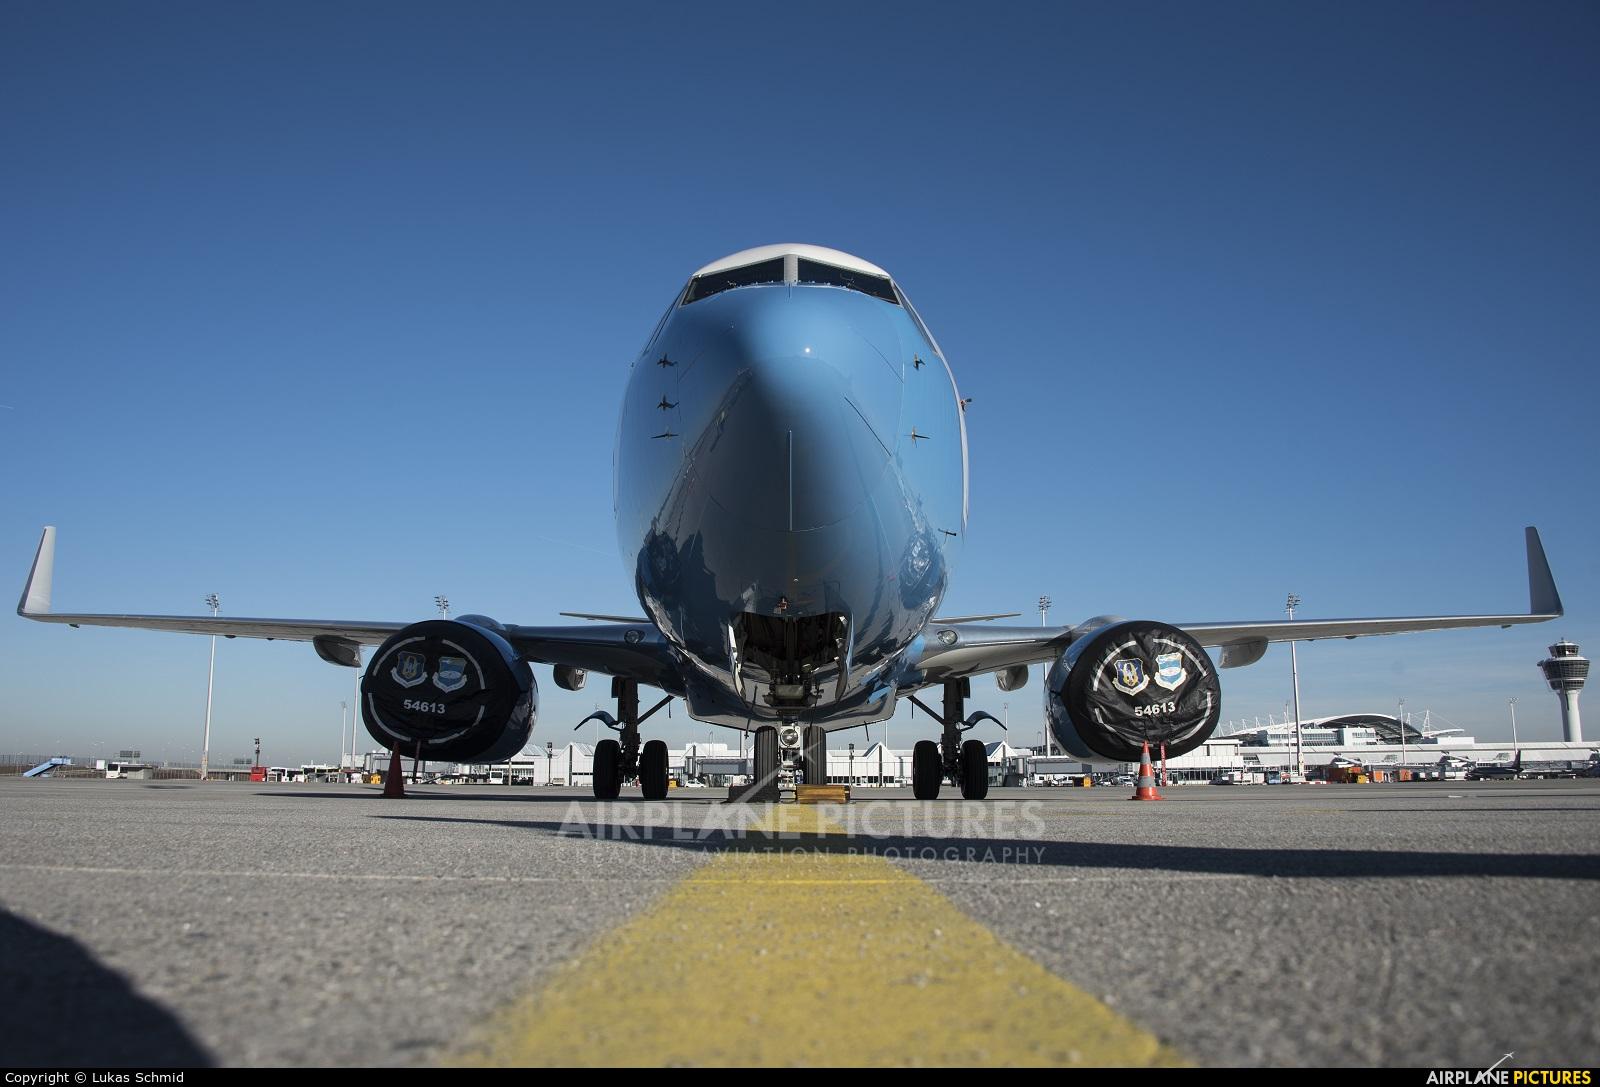 USA - Air Force 05-4613 aircraft at Munich